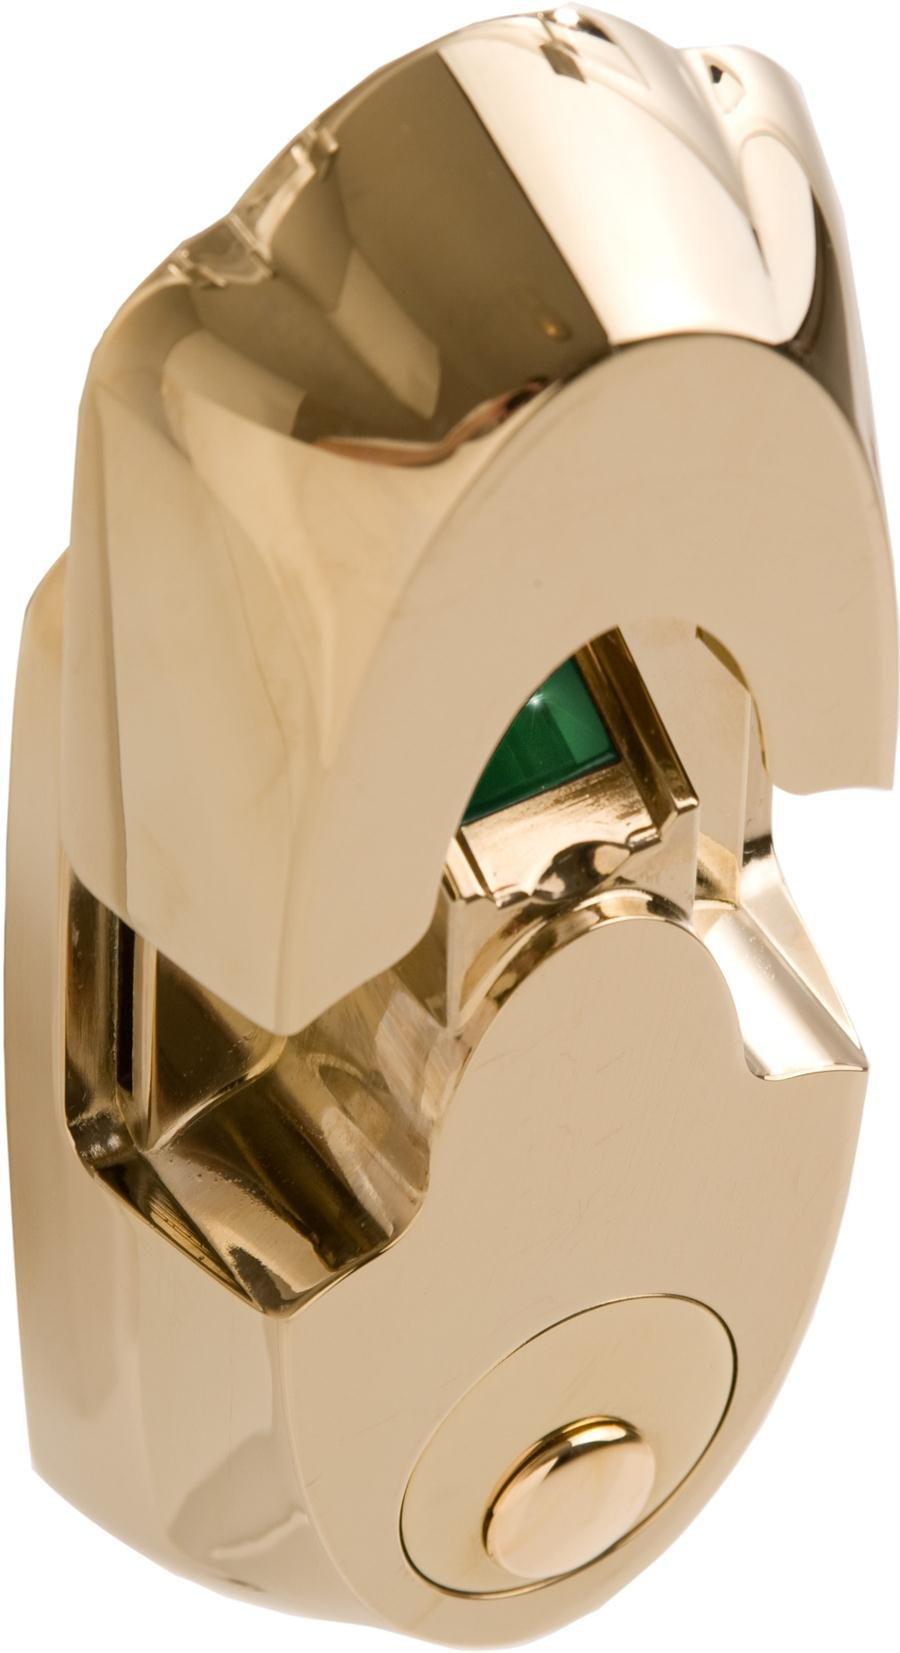 Actuator Systems NextBolt EZ-Mount Biometric Deadbolt Lock Polished Brass